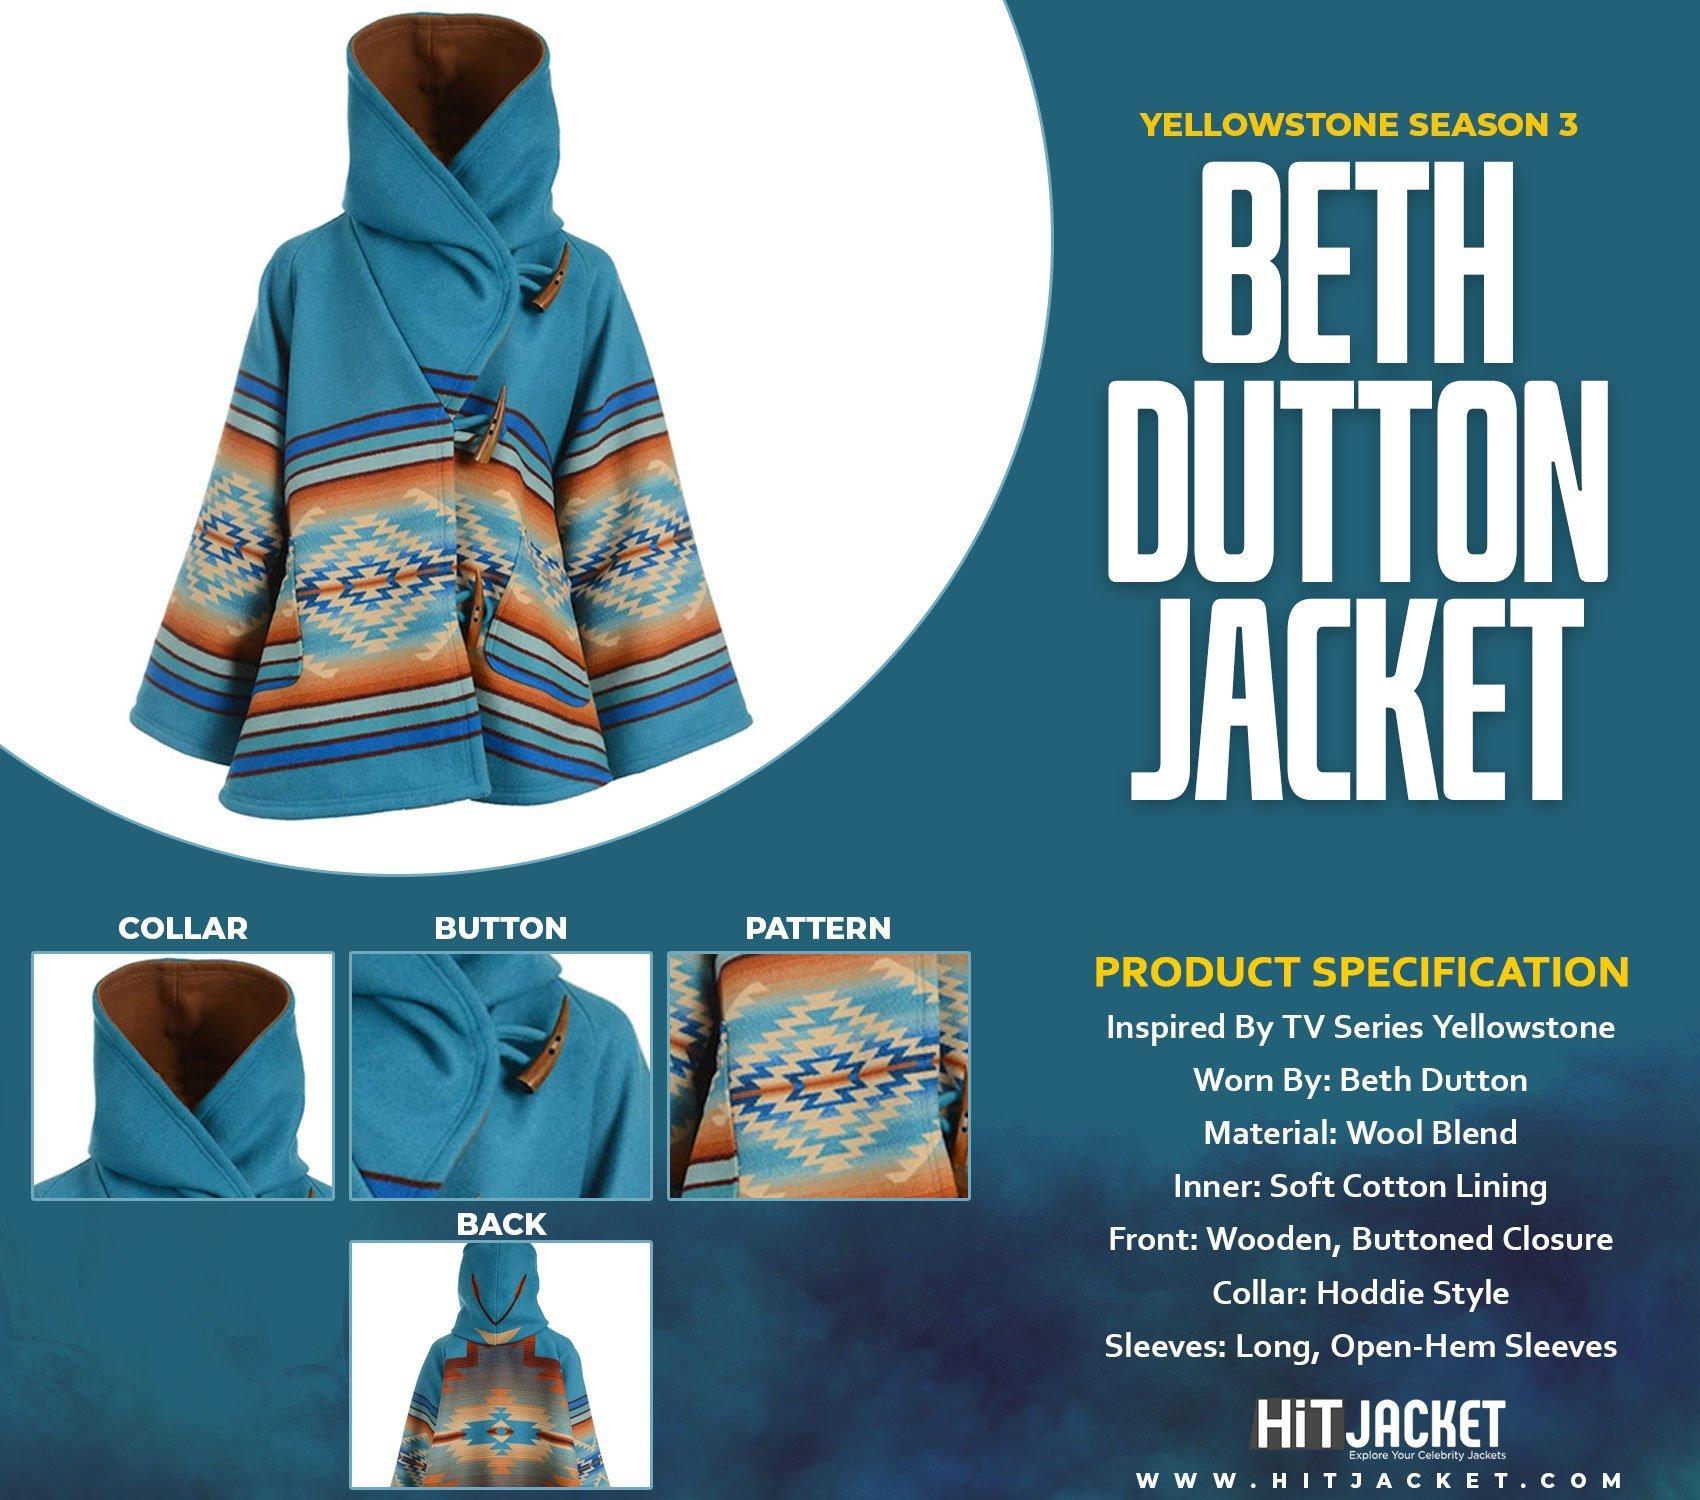 Yellowstone Season 3 Beth Dutton Blue Coat